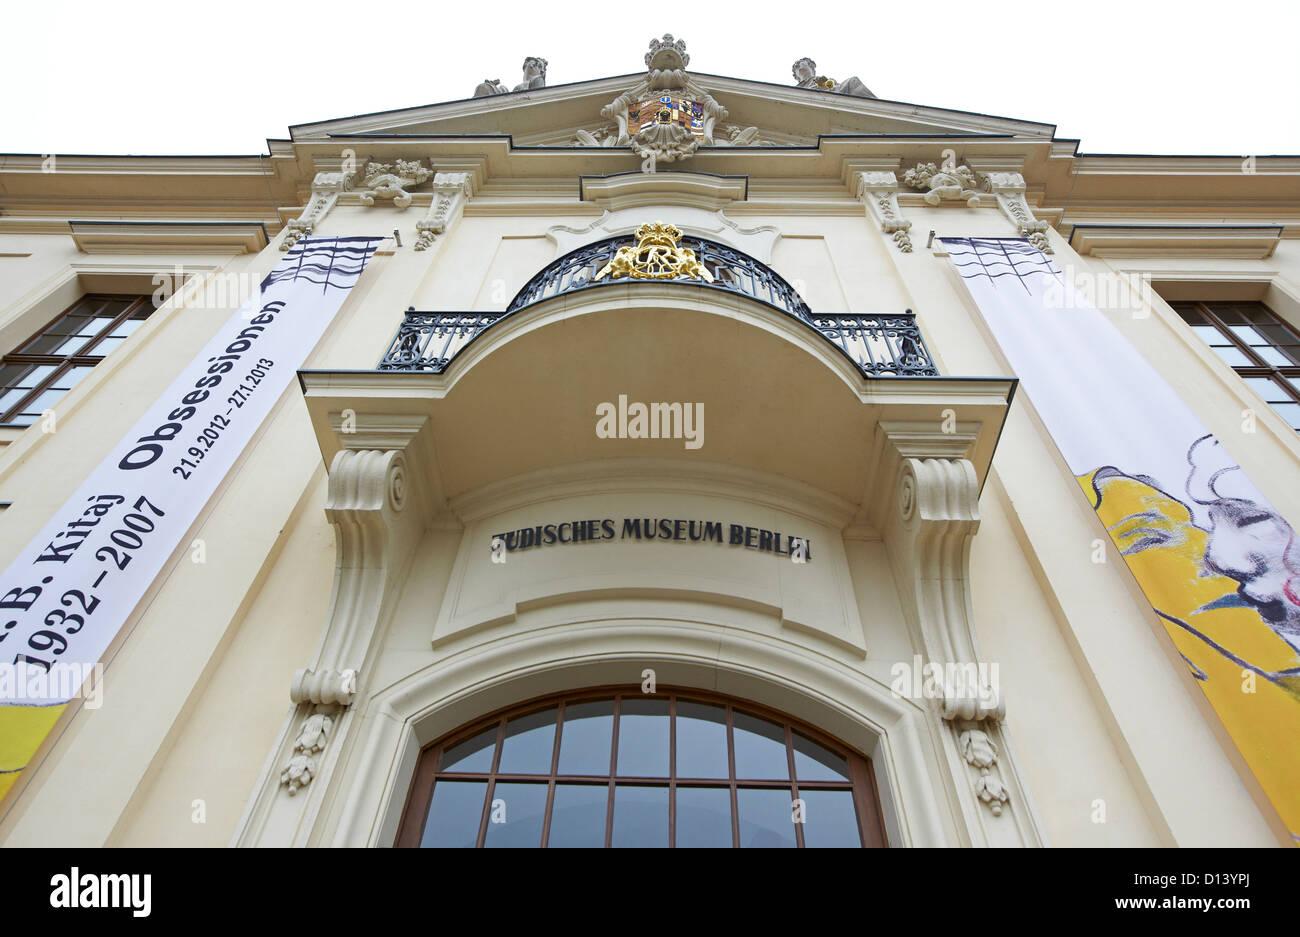 Jewish Museum Berlin Germany - Stock Image